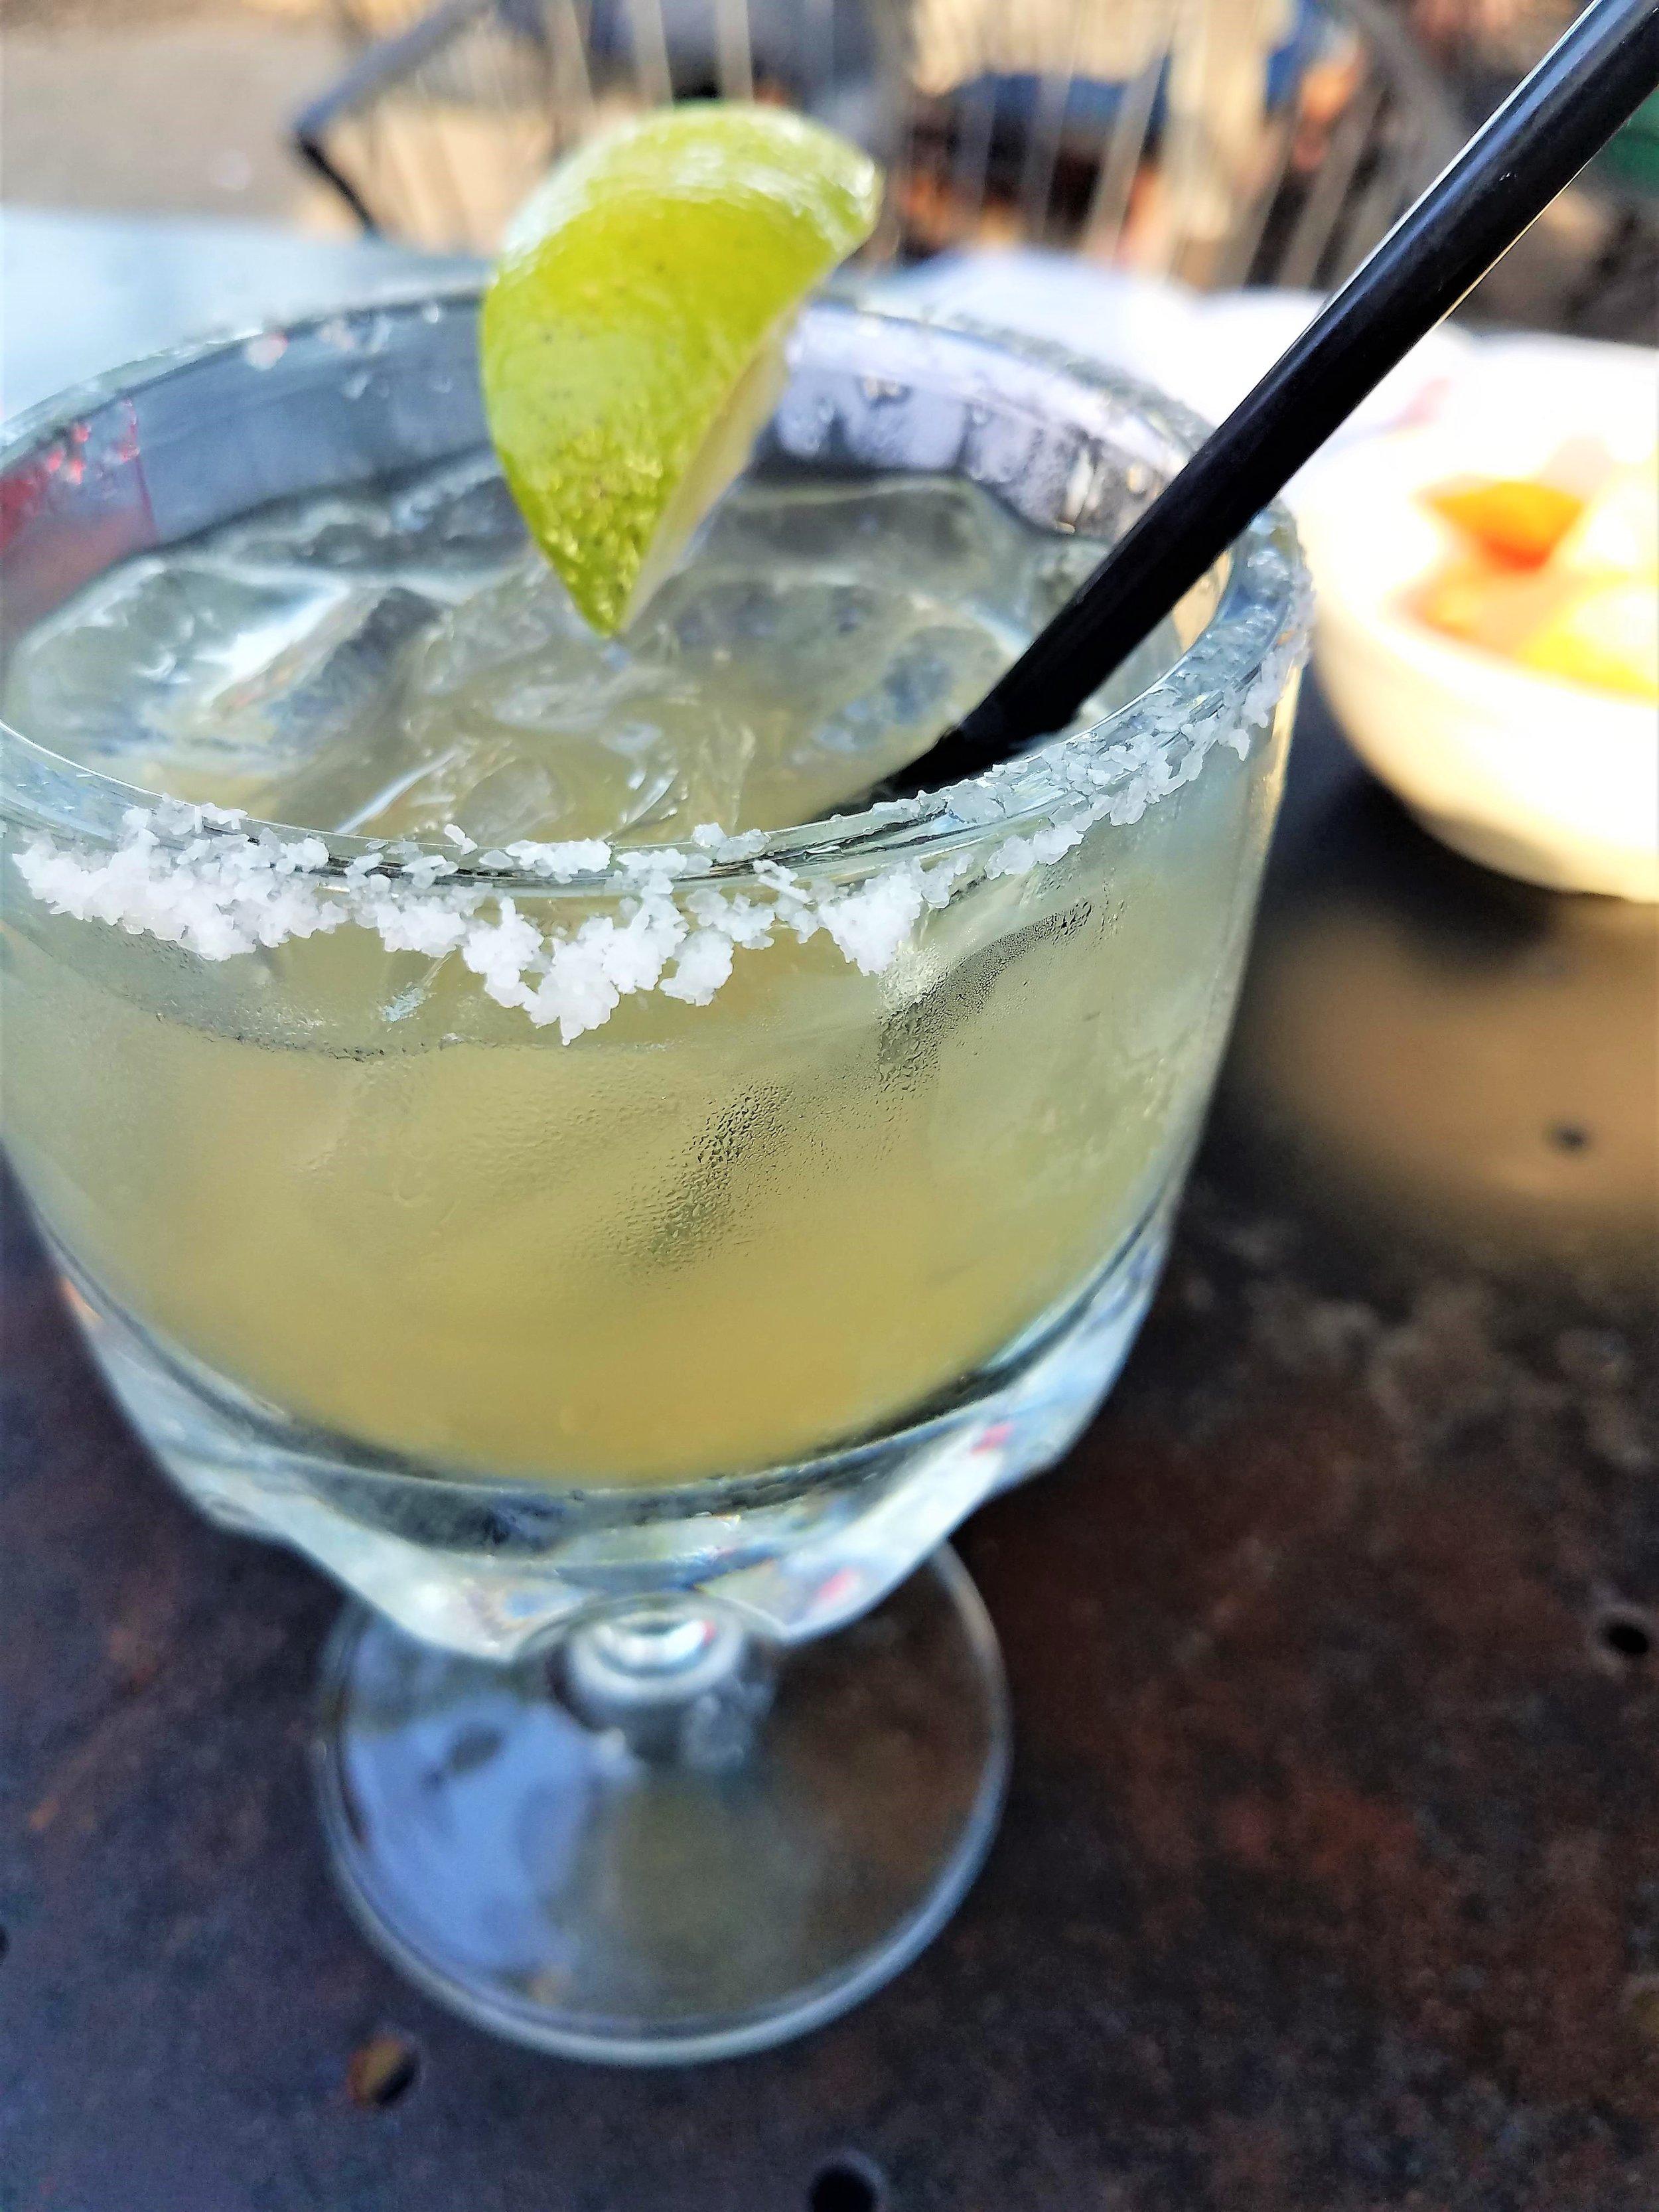 la hacienda scenic loop boerne san antonio texas family friendly restaurant sowing seeds blog